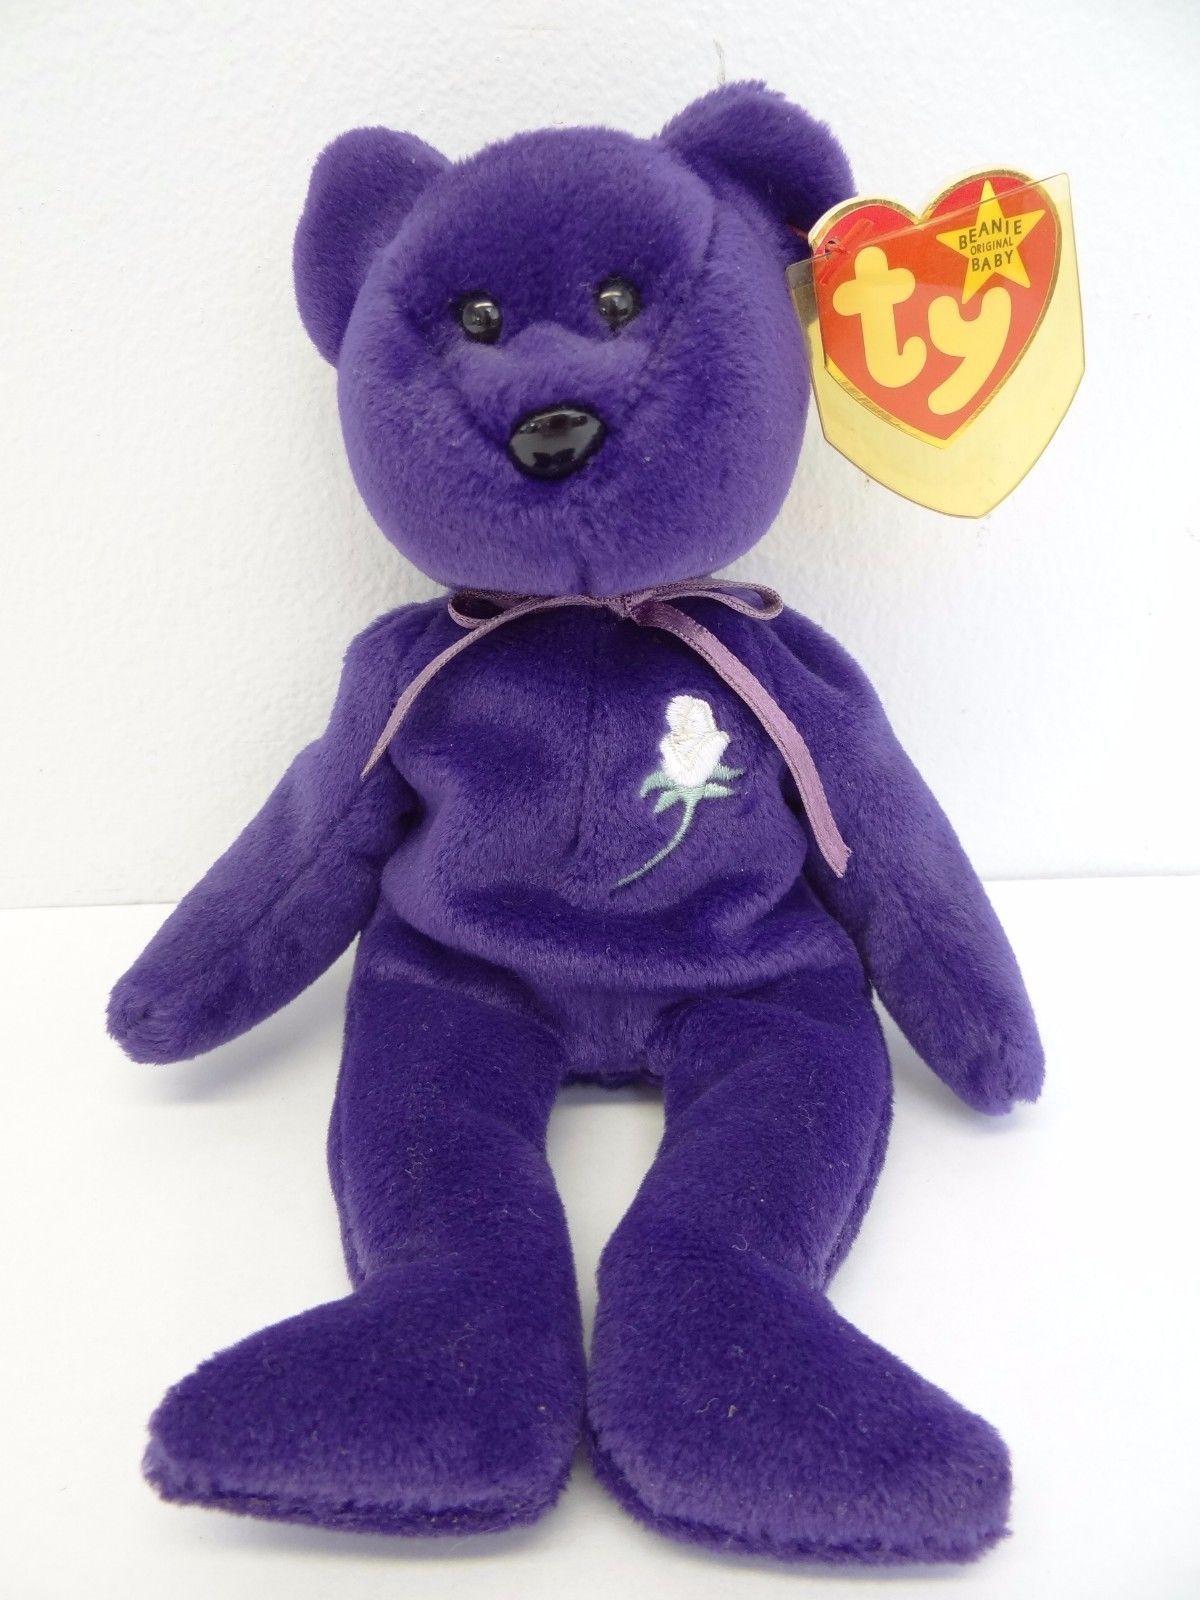 Original 1997 Purple Rare Retired China Princess Di Diana Ty Beanie Baby Bear 10 000 00 Beanie Baby Bears Princess Diana Beanie Baby Original Beanie Babies